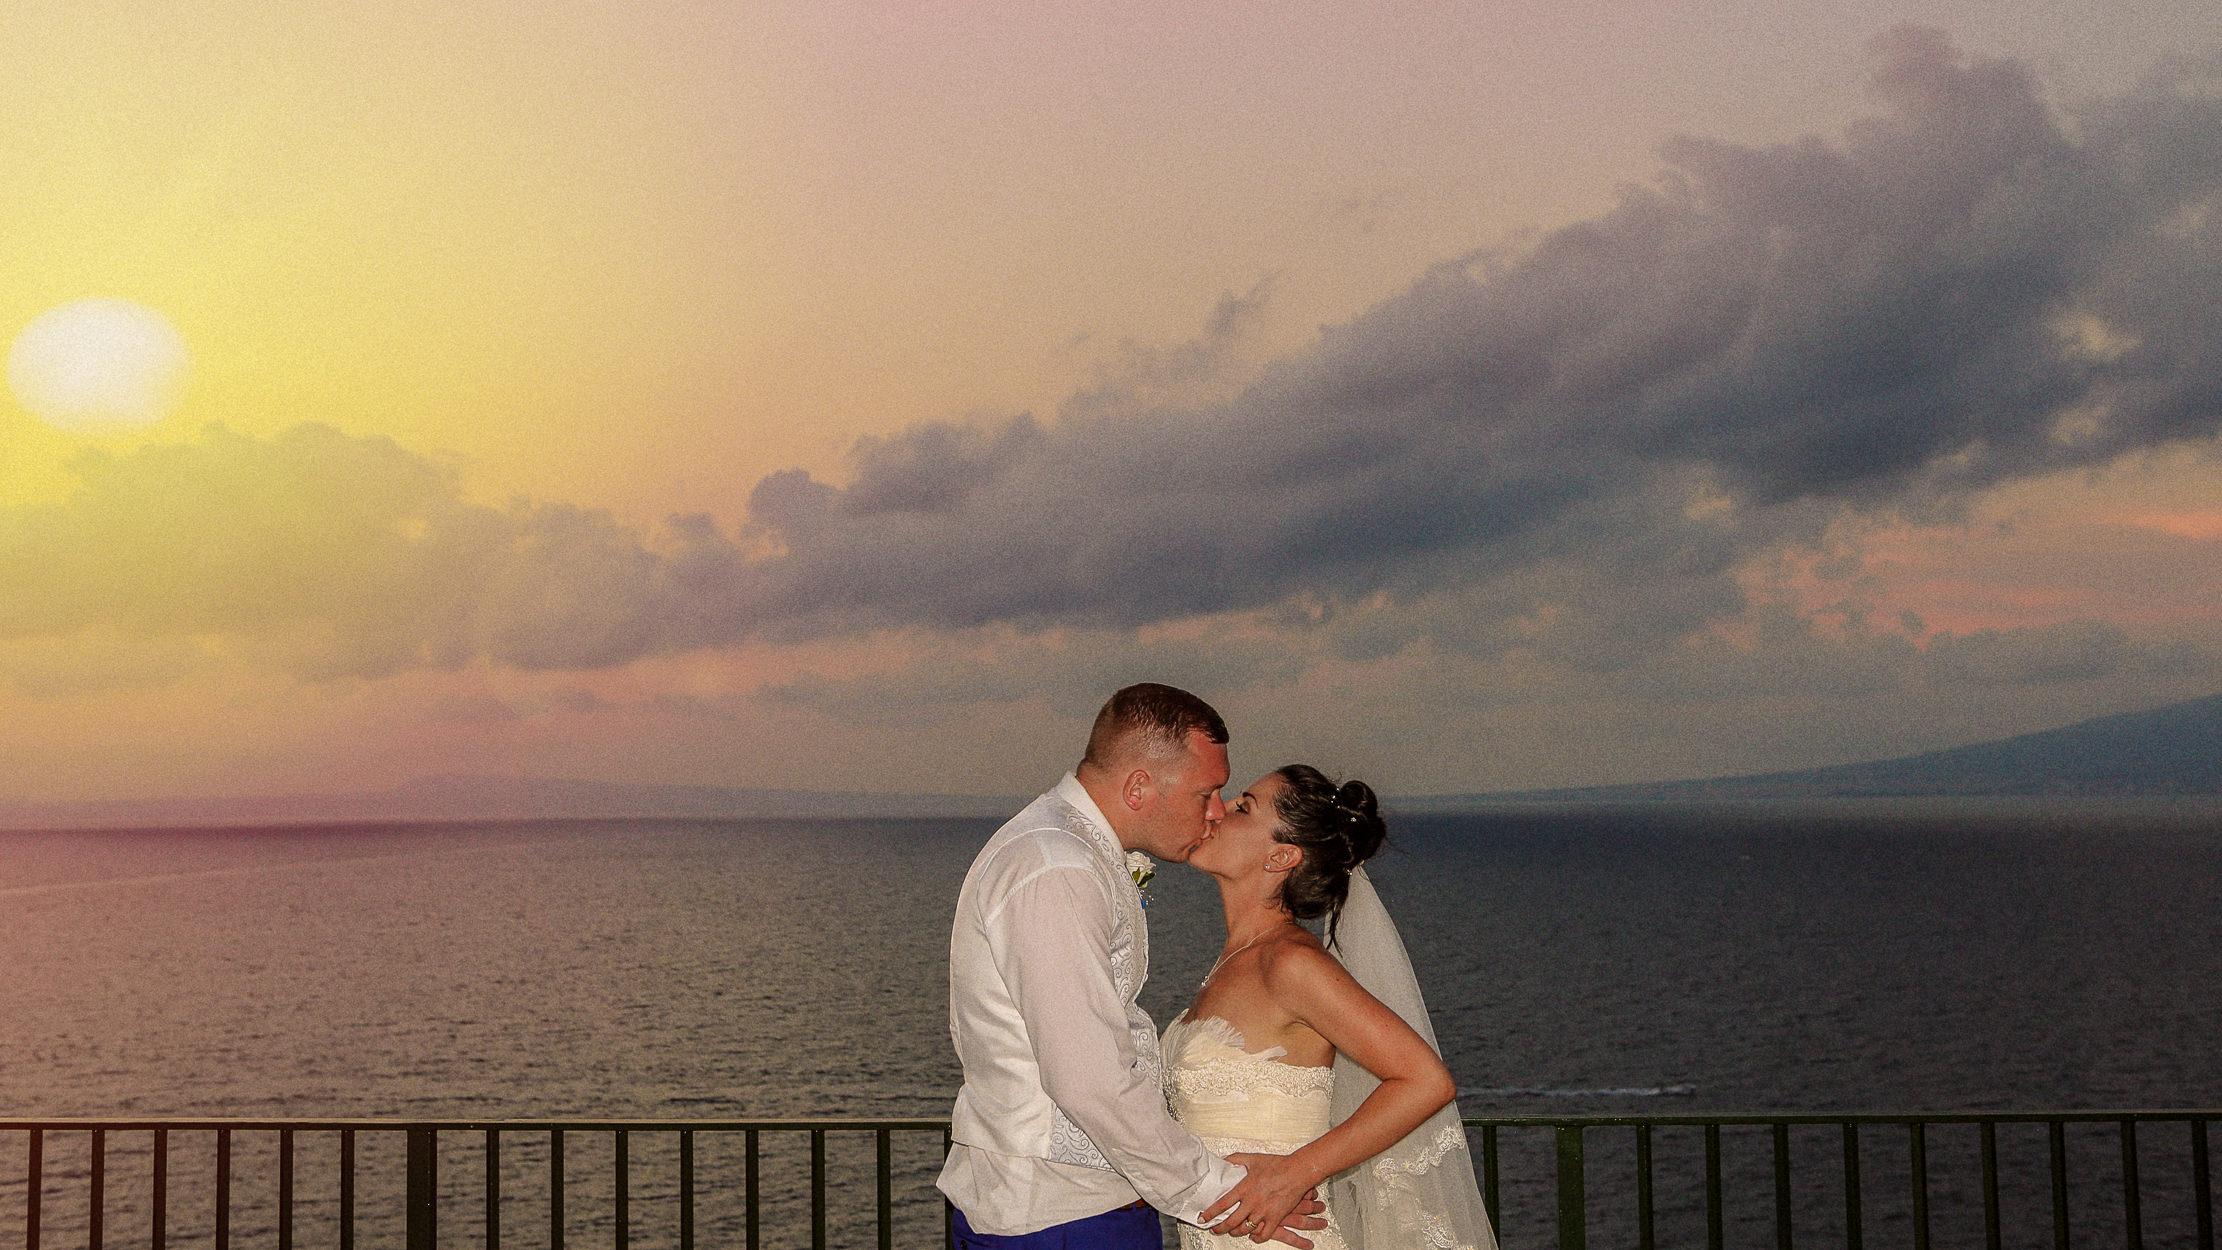 Amalfi-Coast-wedding-venue-Wedding-Photography-Villa Antiche Mura-Sorrento-Italy-30